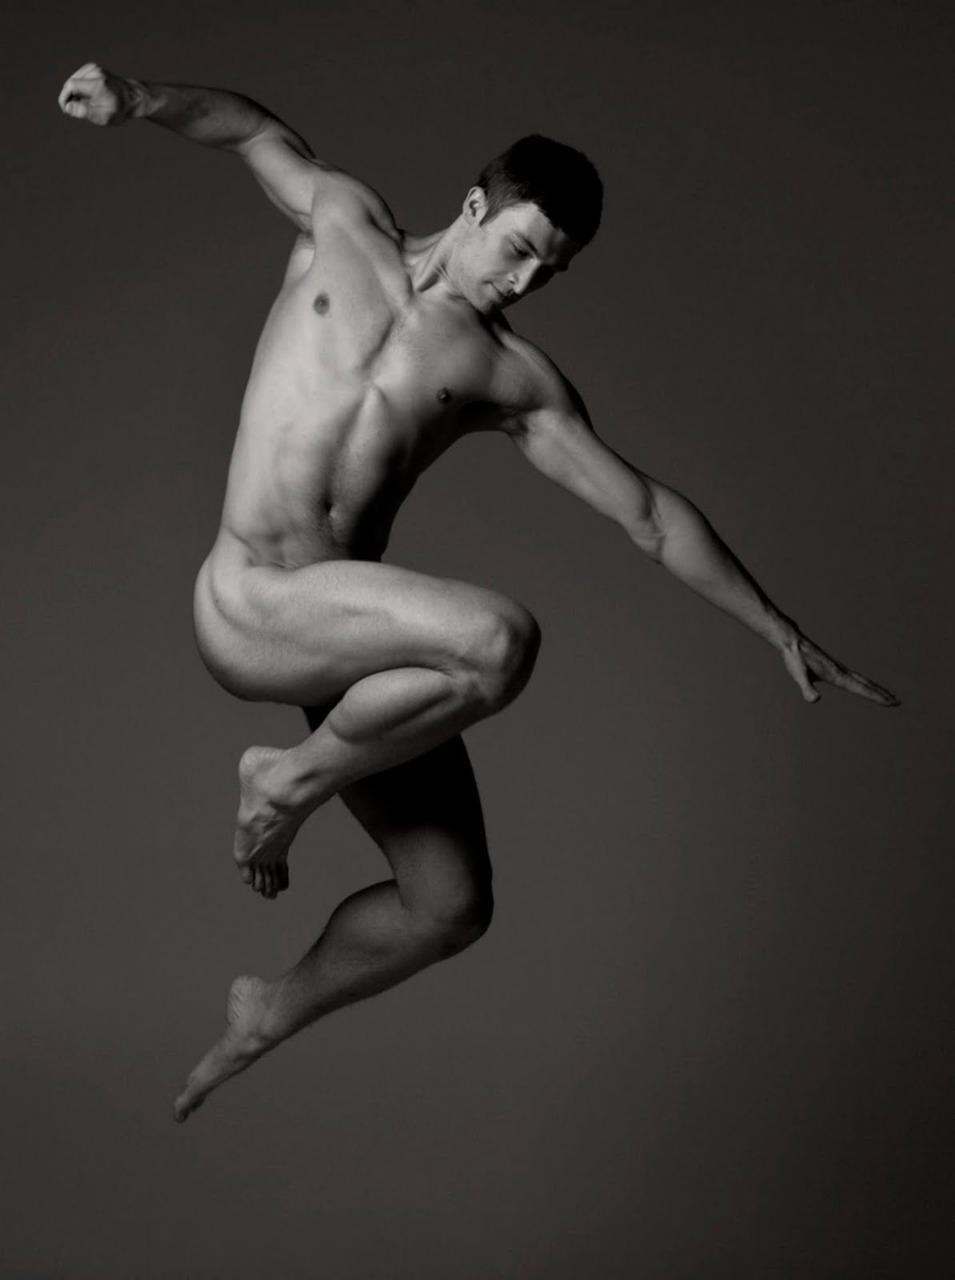 Accidentally drew pare nude model